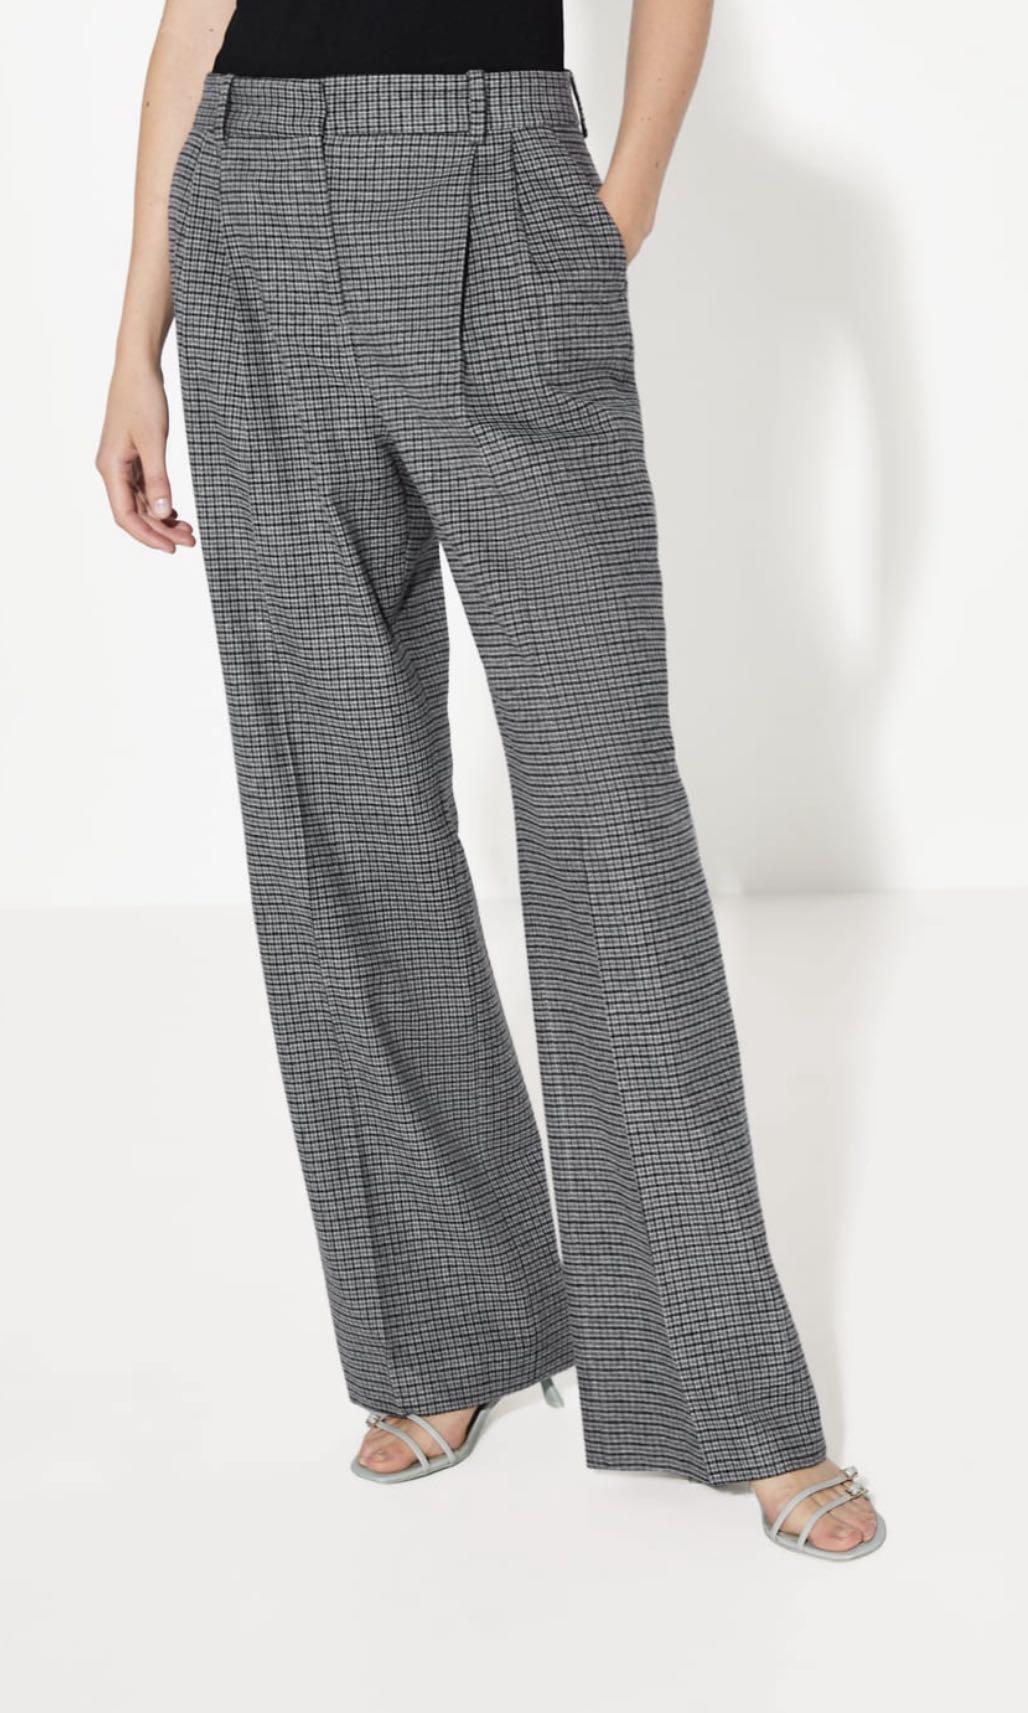 Zara Checked Wide Leg Trouser. Size 6. Worn Twice.